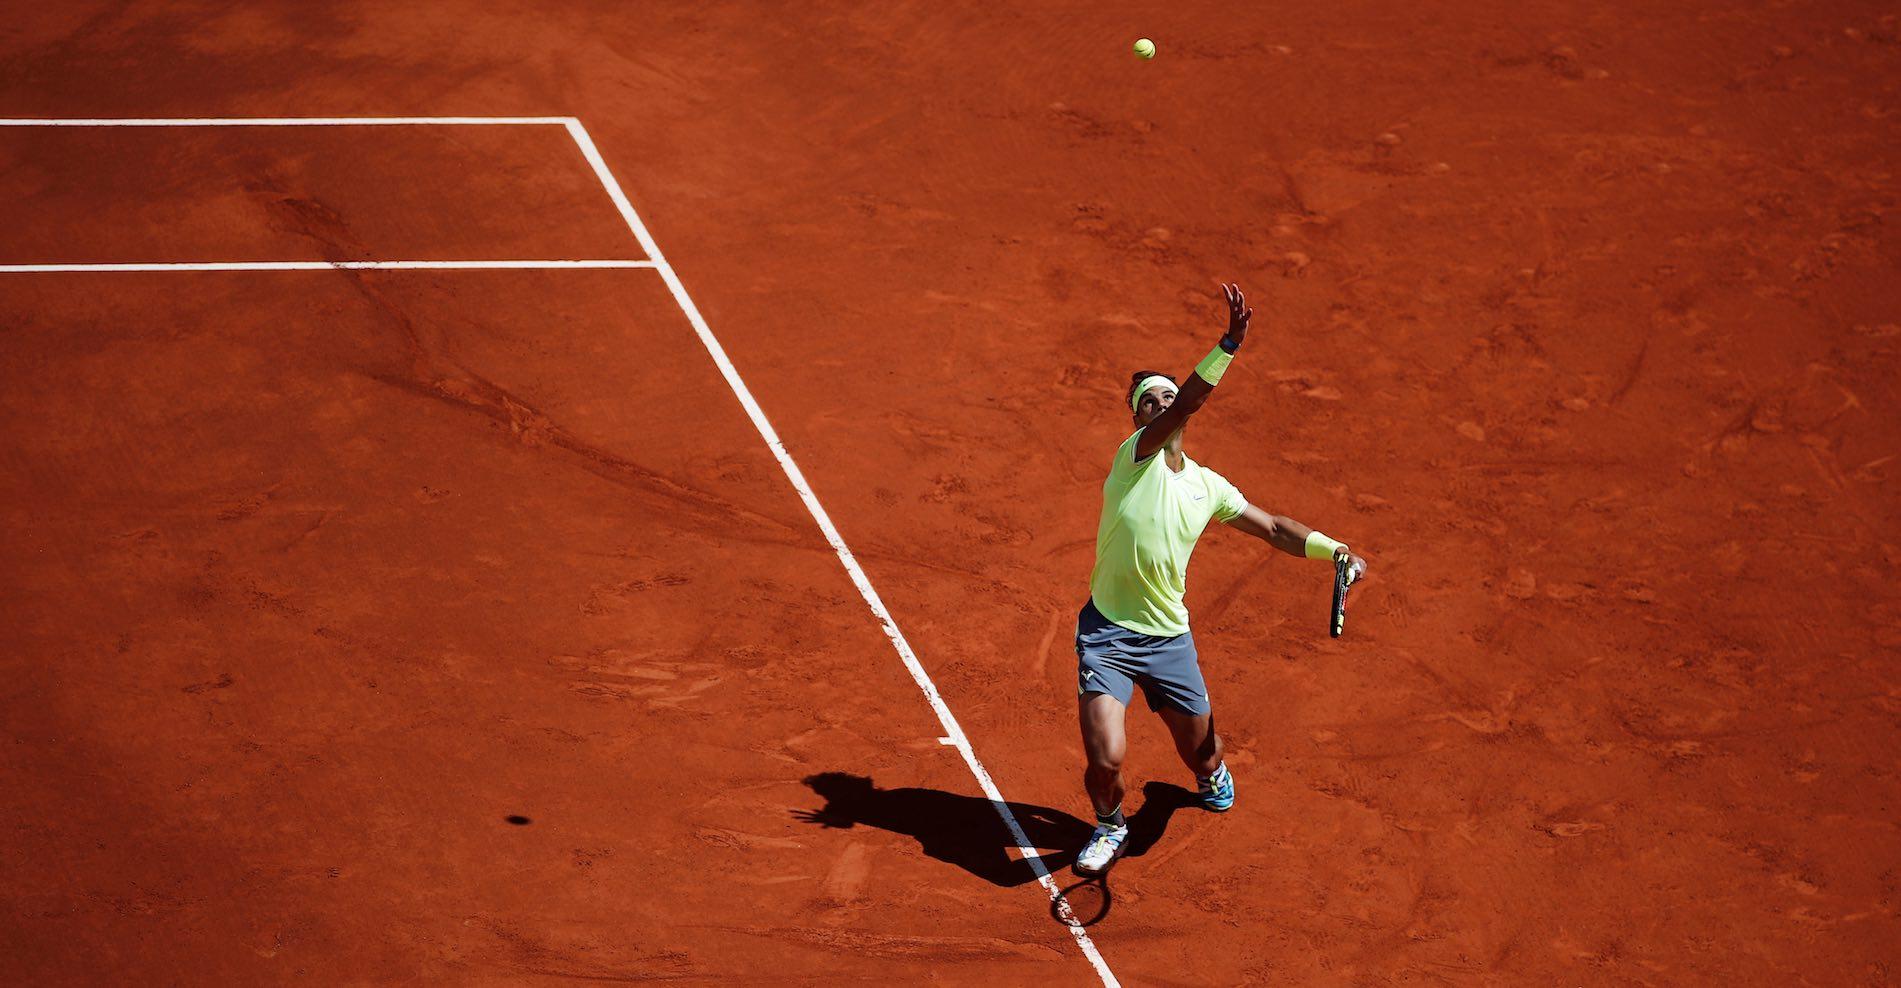 Rafael Nadal at Roland-Garros 2019